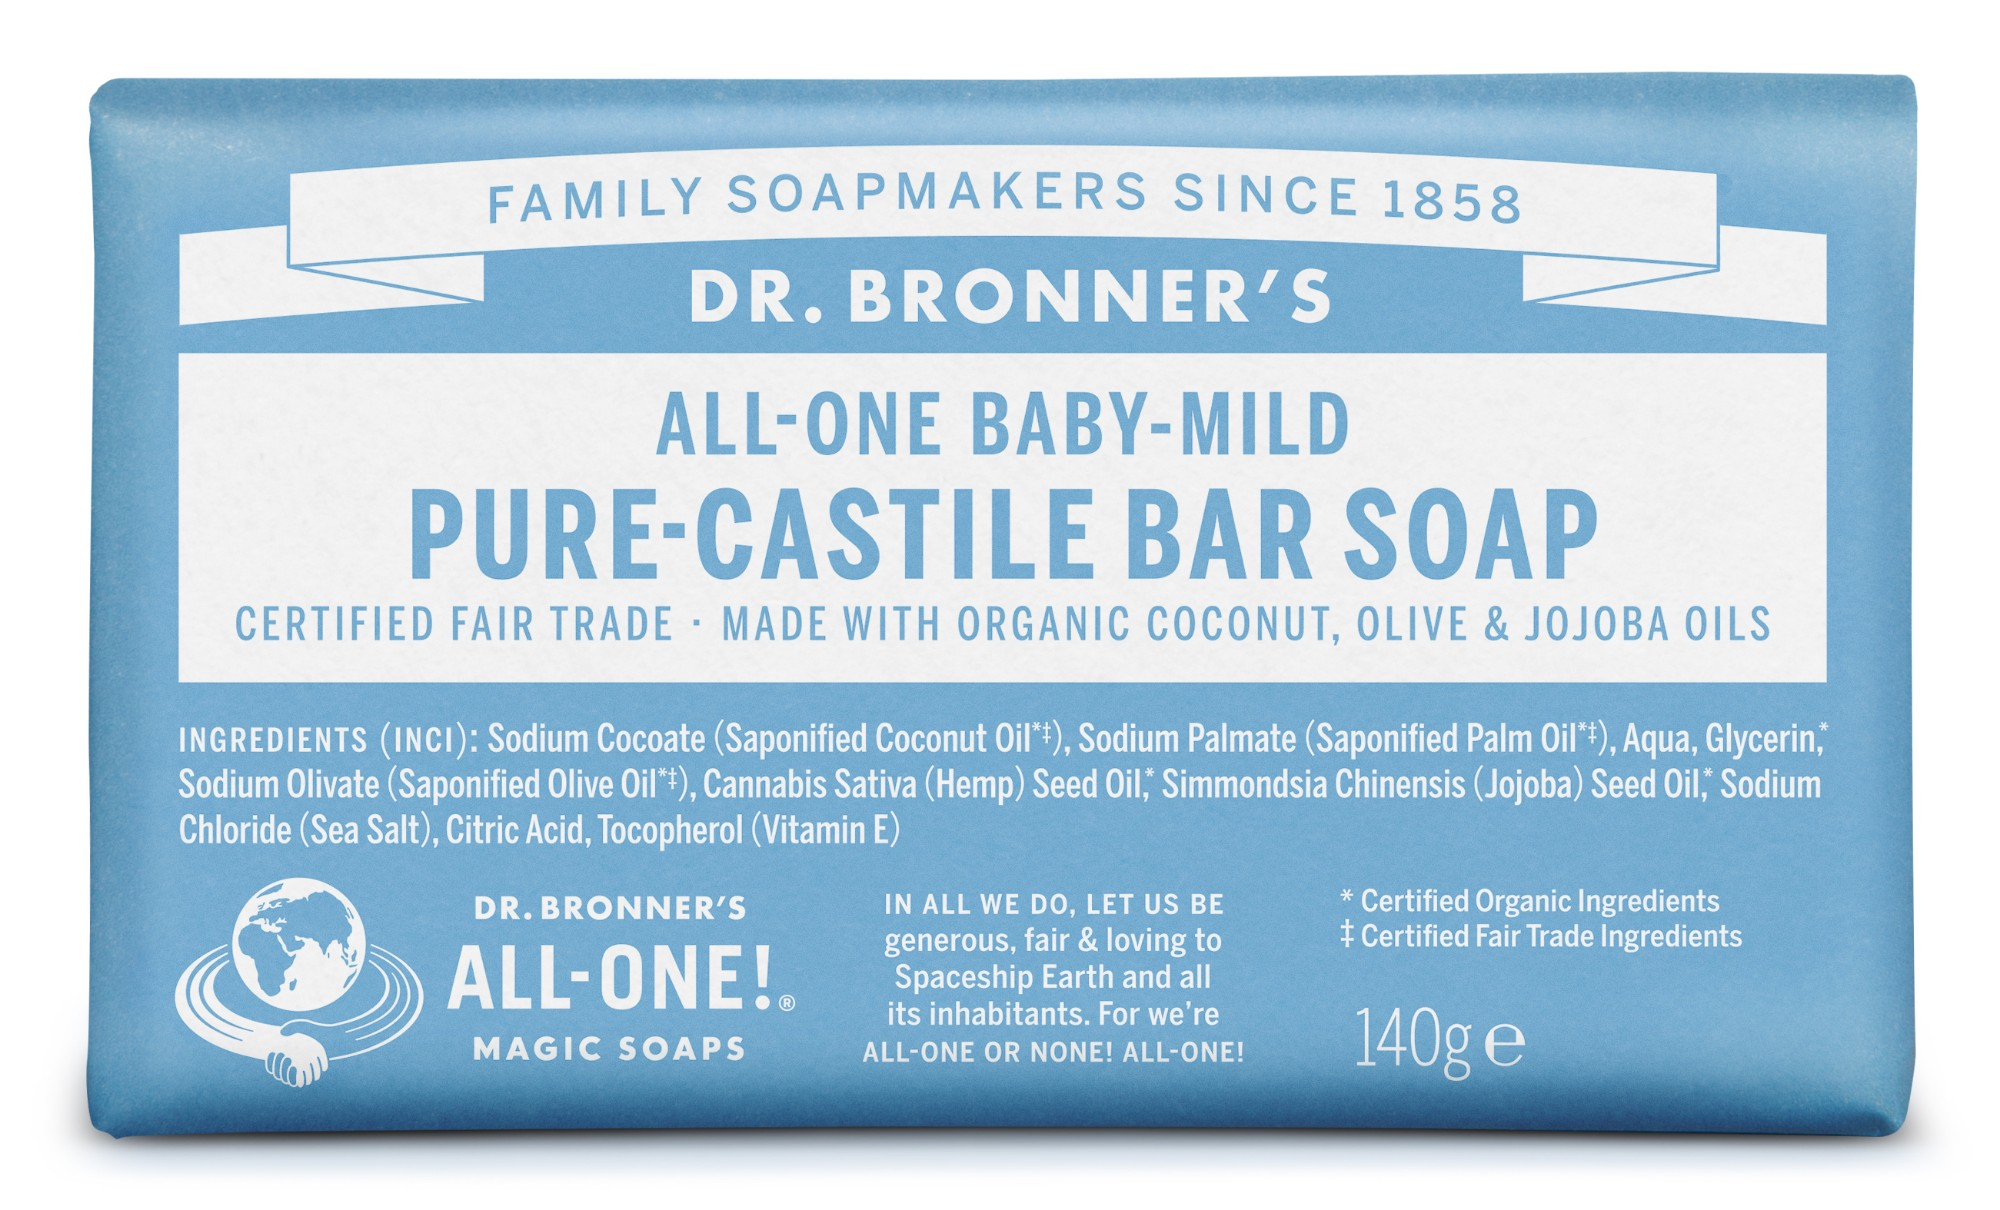 Ekologiškas tyras kastilietiškas muilas DR. BRONNER'S Baby-Mild 140 g